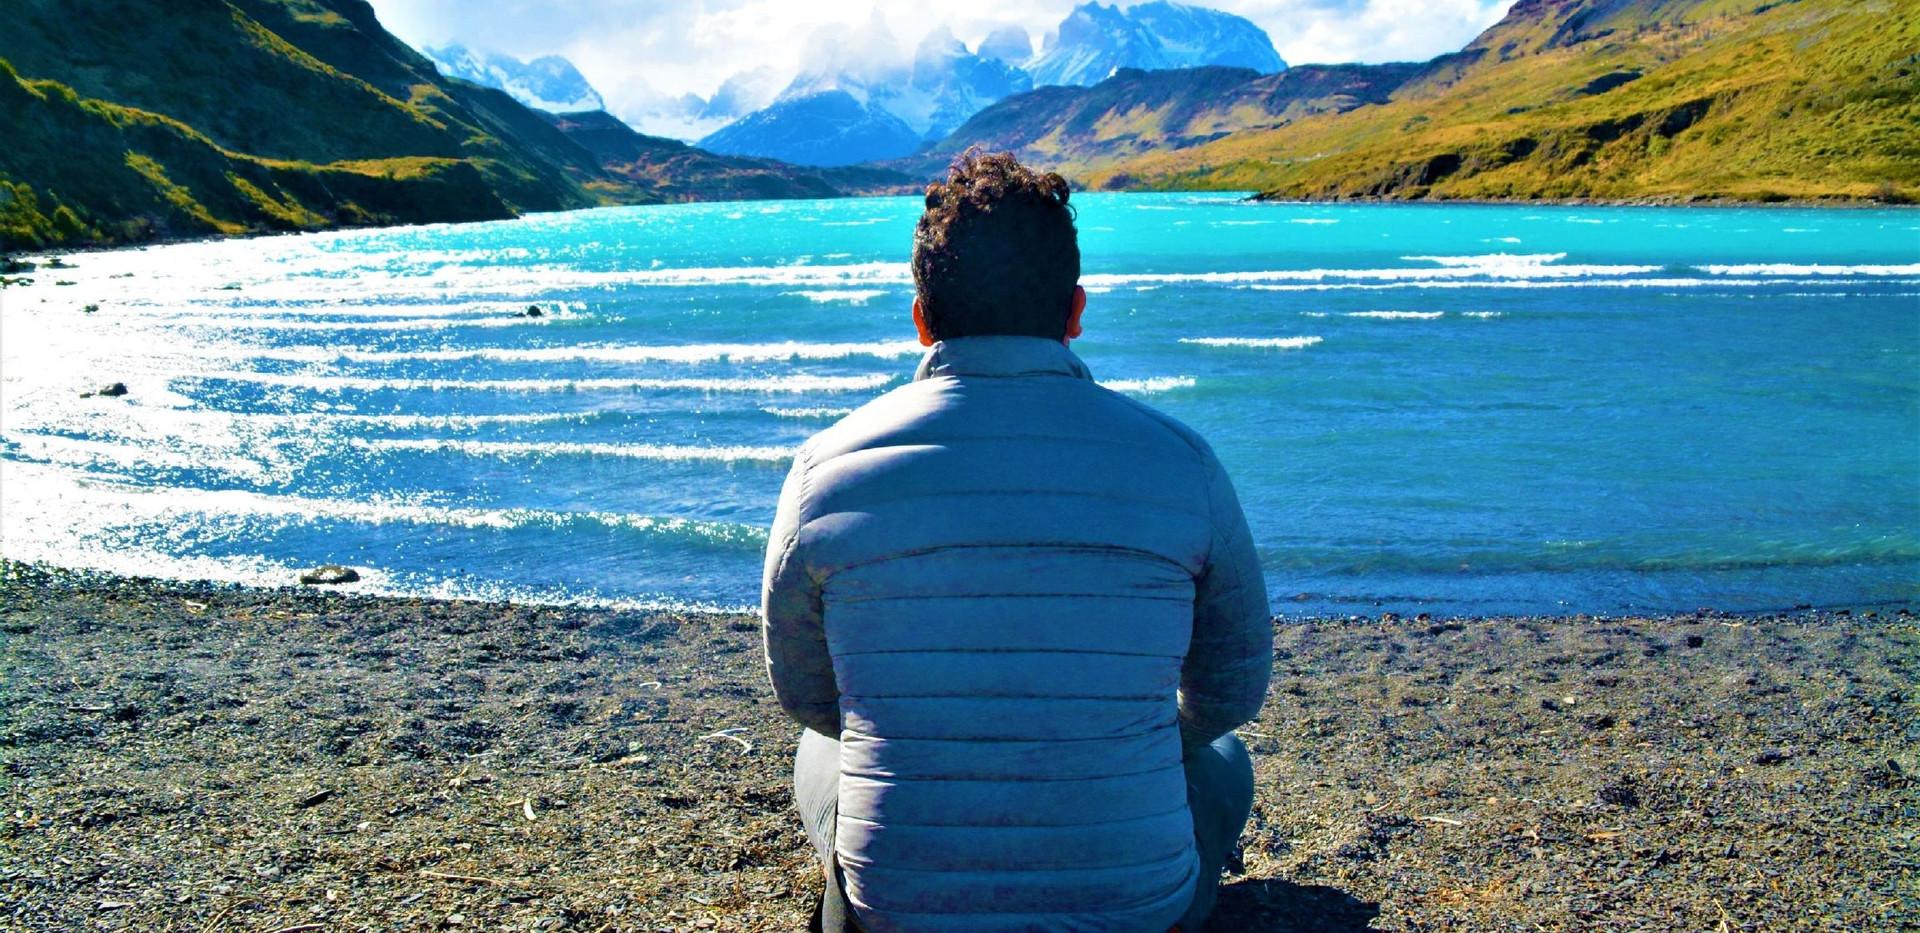 Parque Nacional Torres del Paine Puente Weber